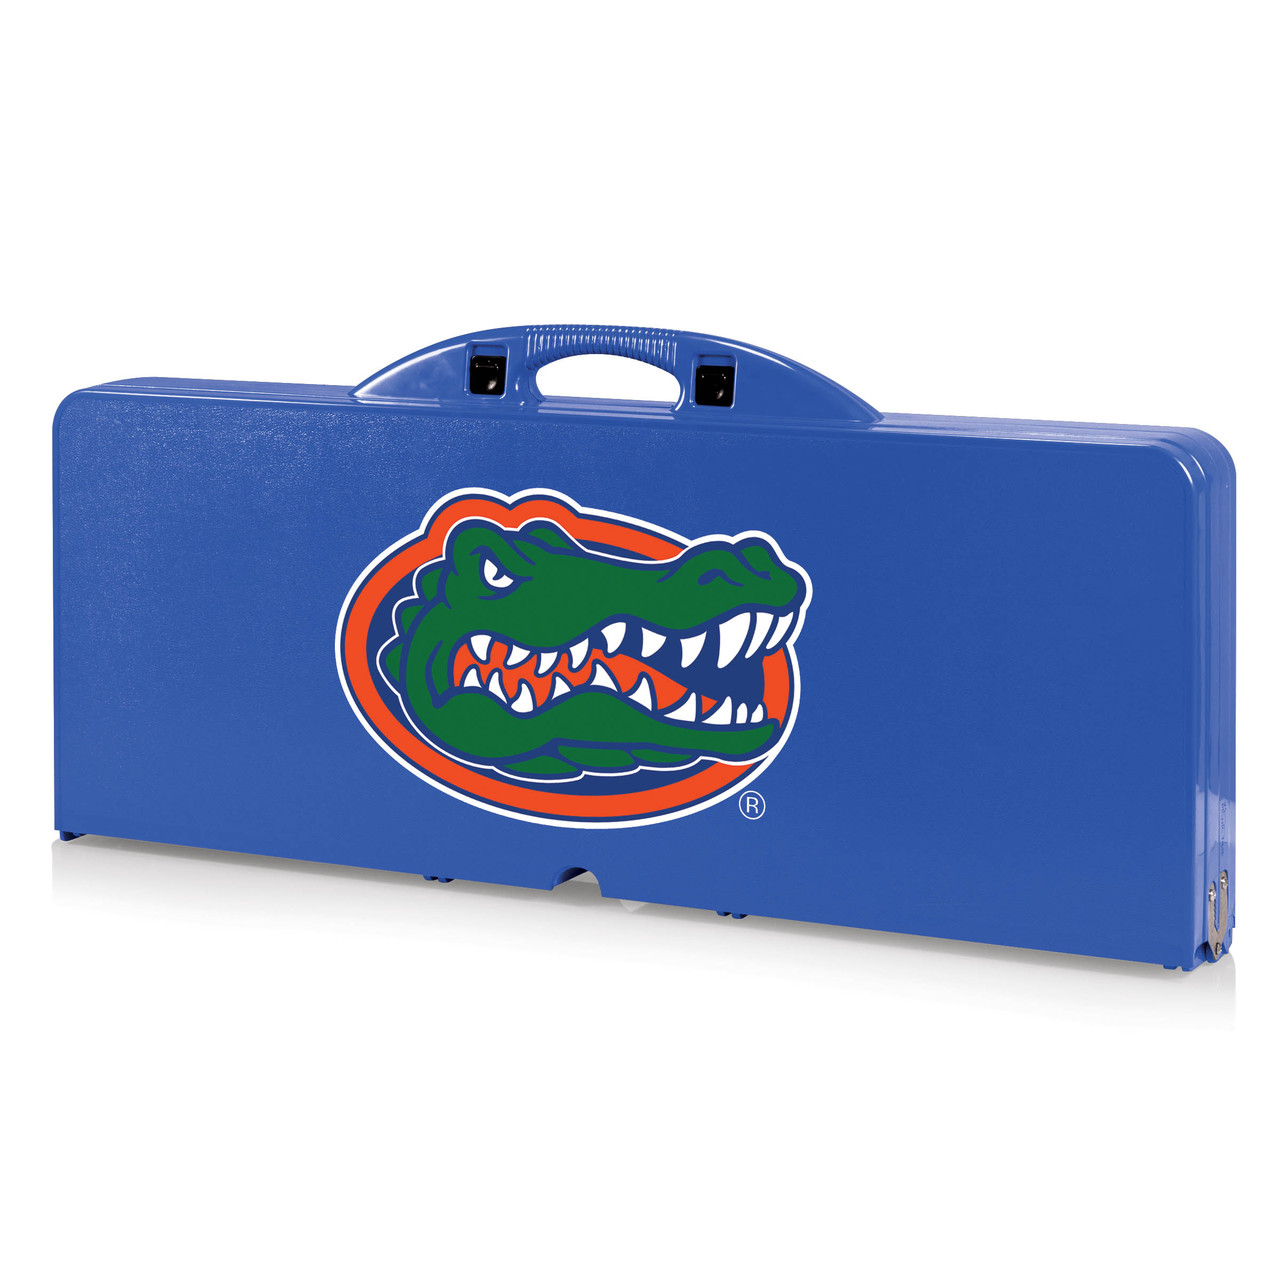 Picnic Table - University of Florida